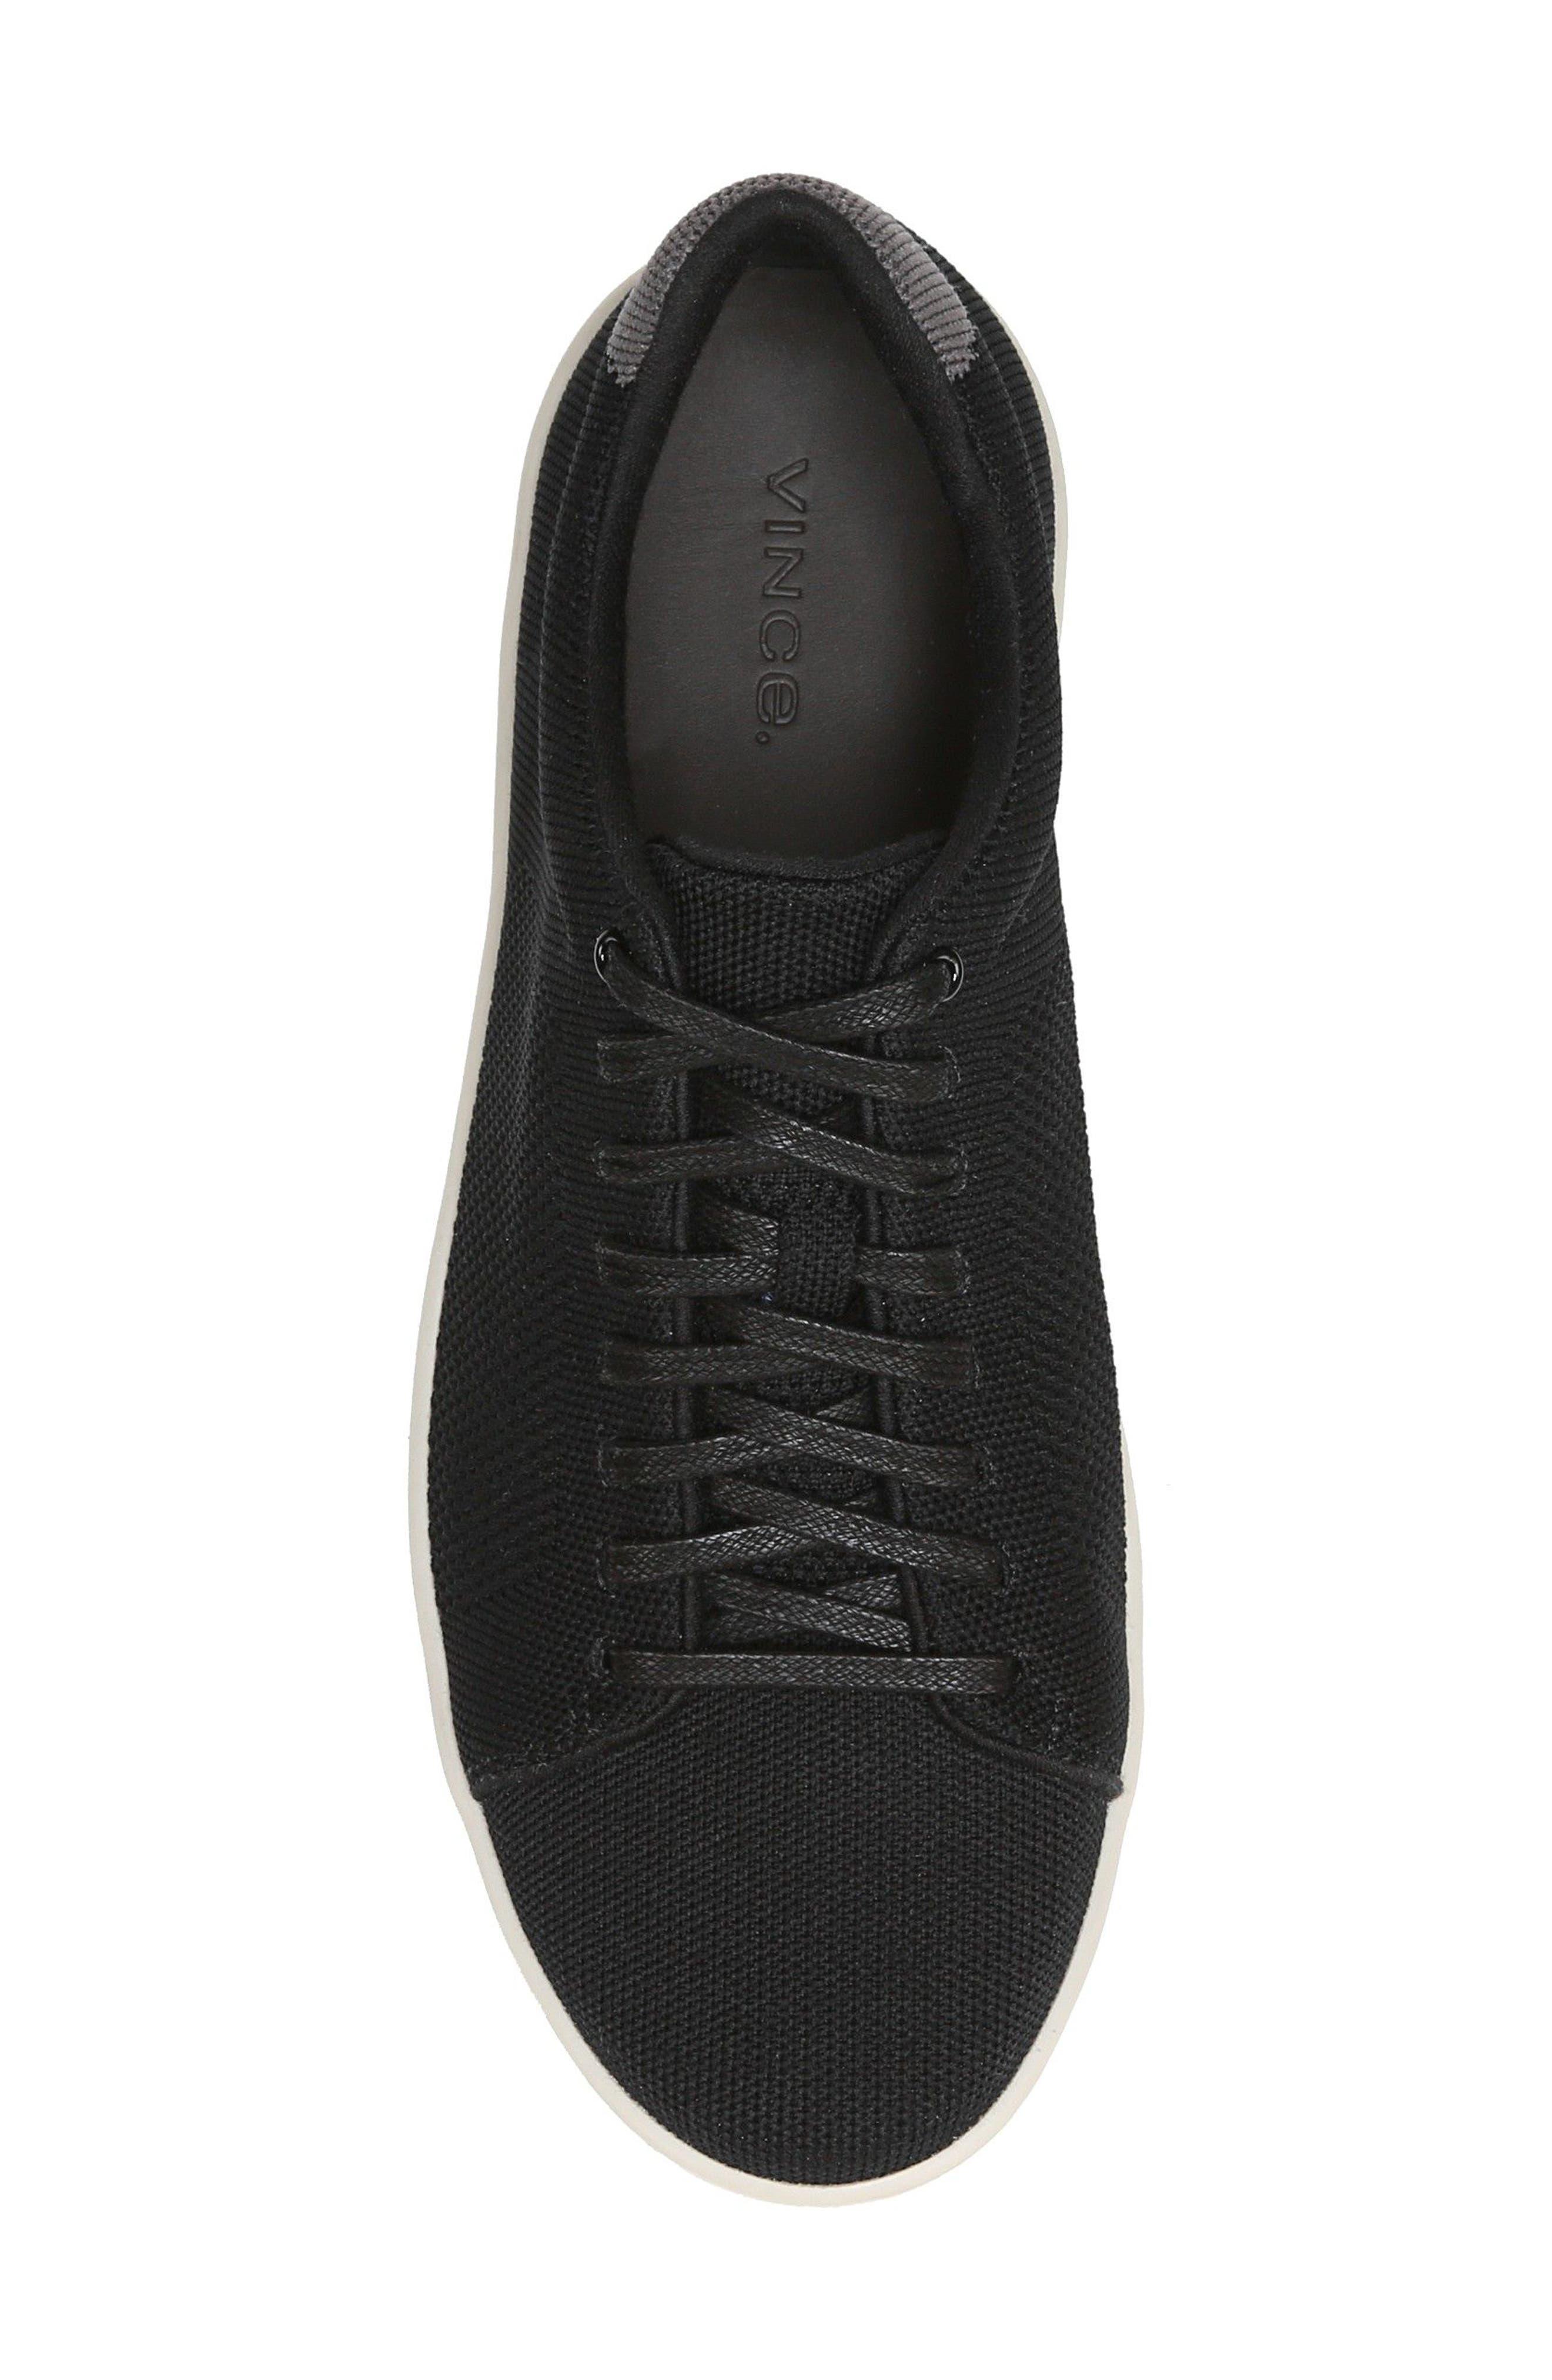 Silos Knit Low Top Sneaker,                             Alternate thumbnail 5, color,                             BLACK/ GRAPHITE